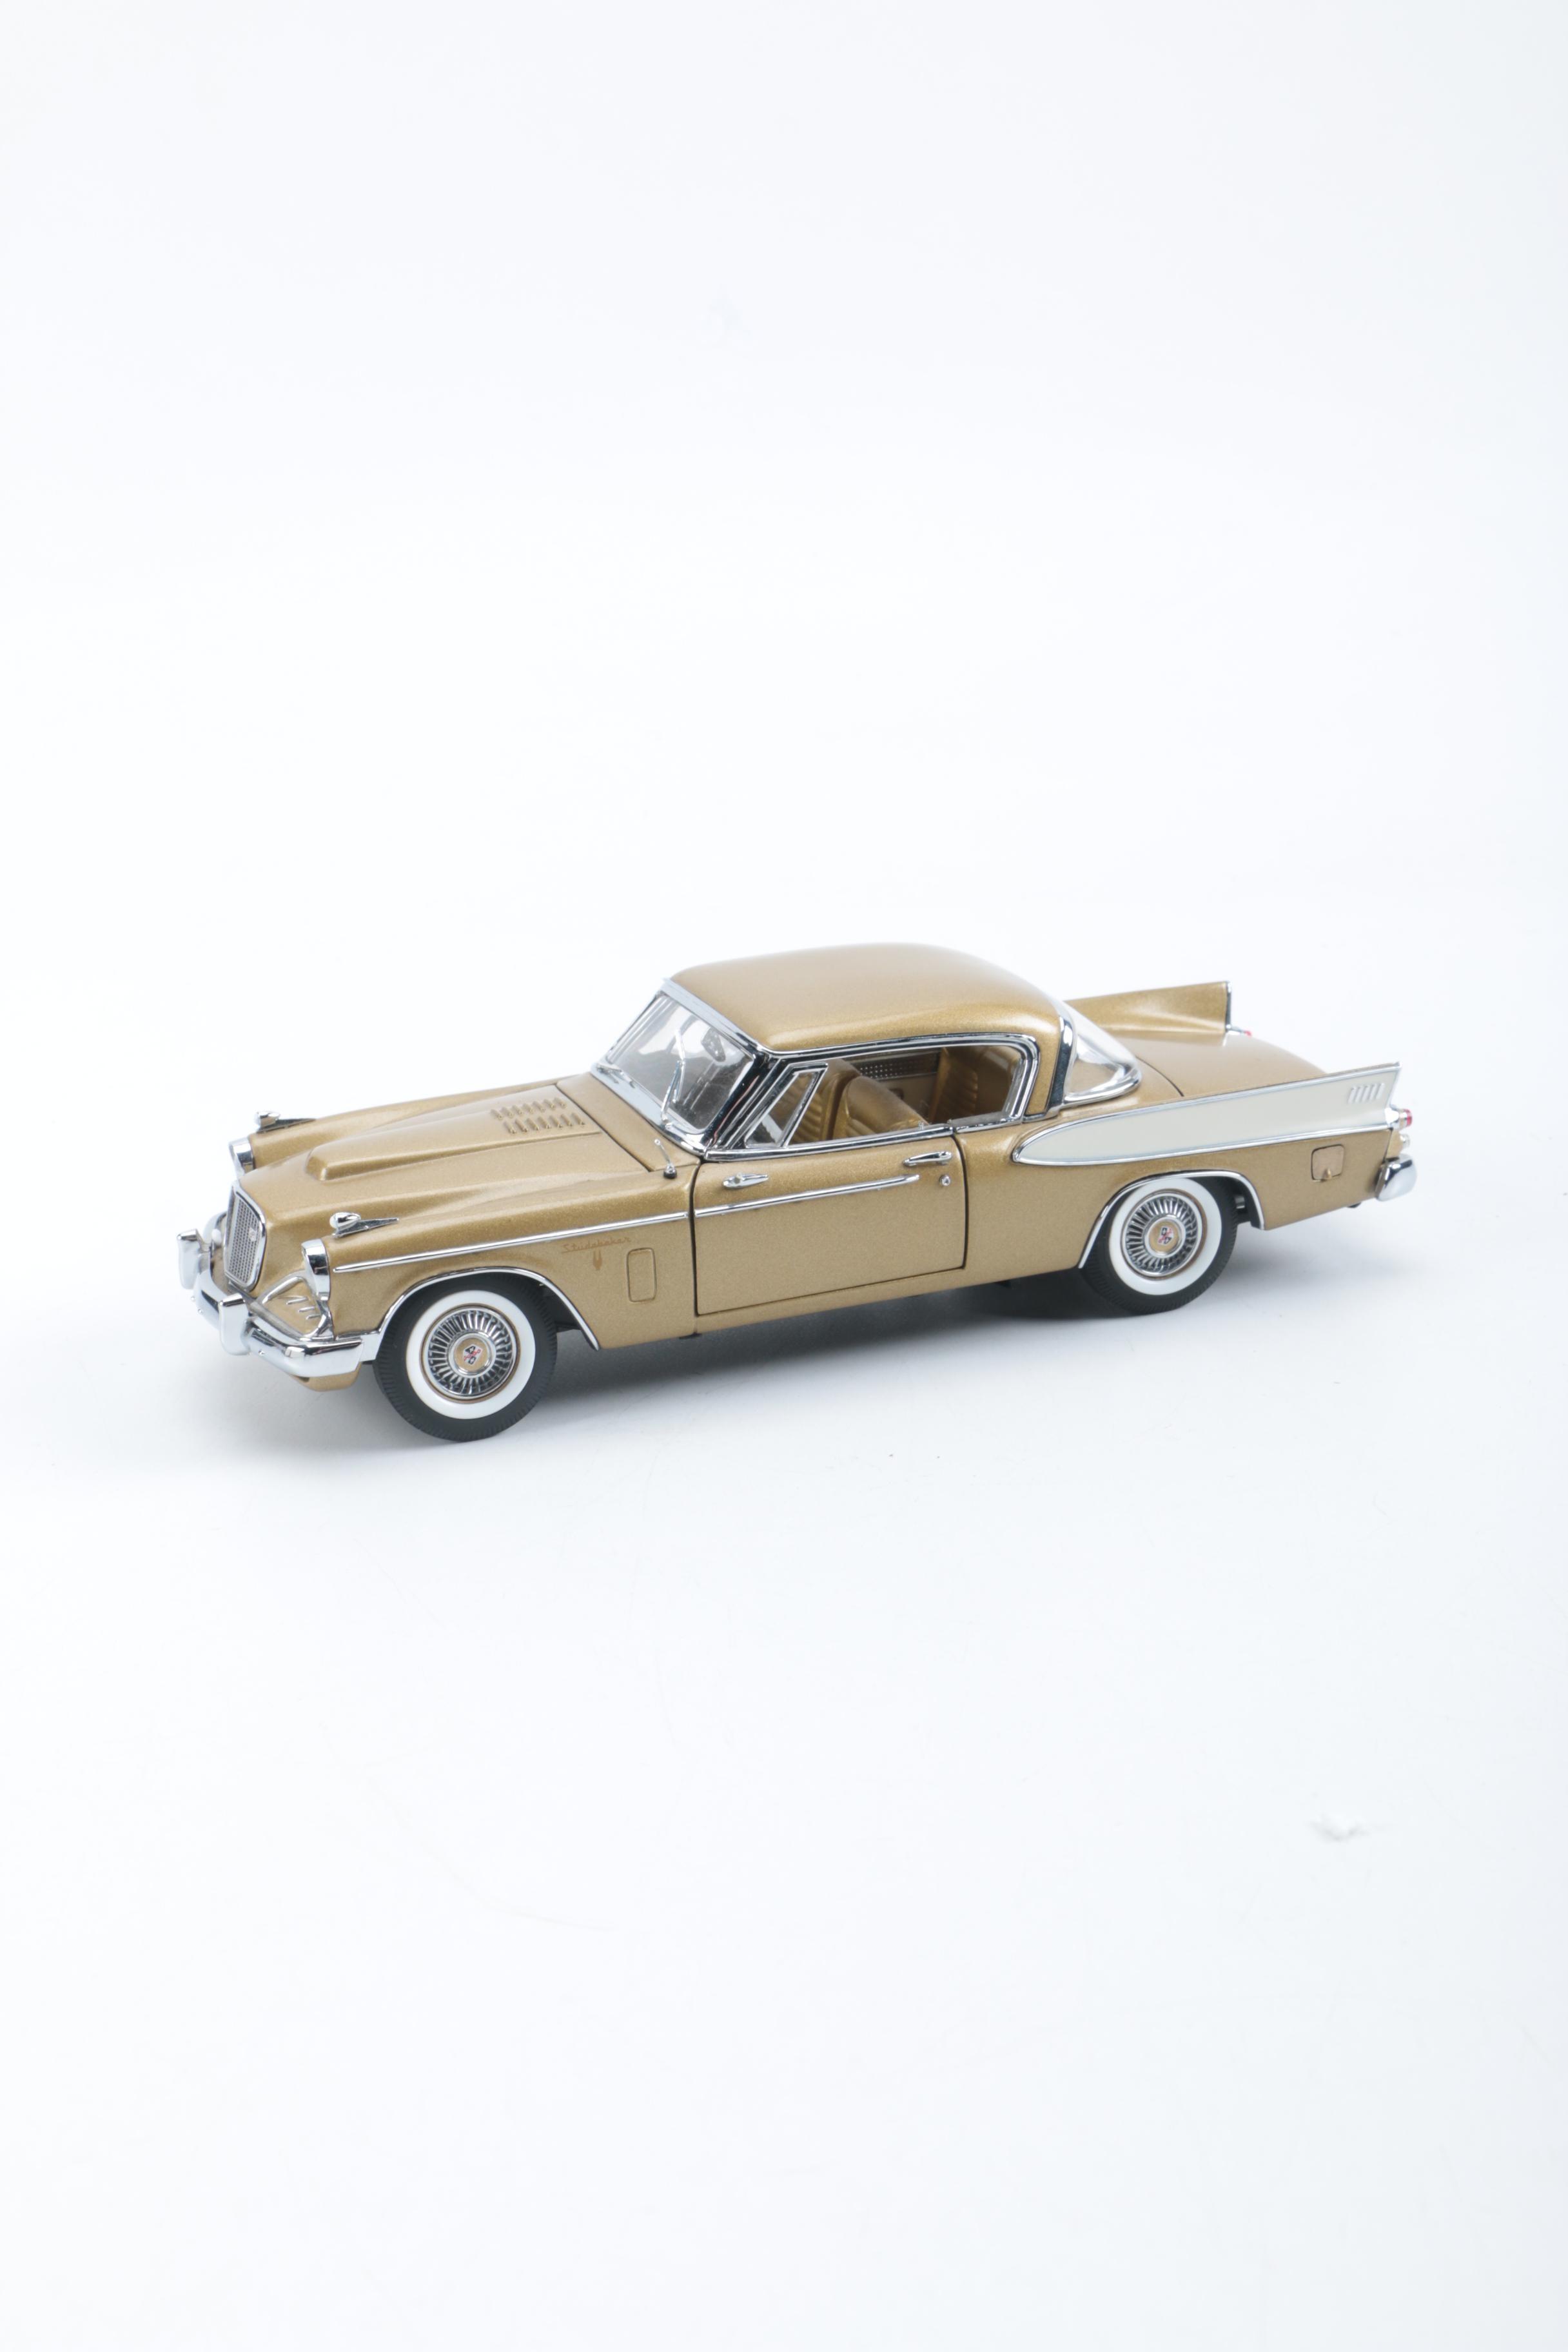 Danbury Mint 1957 Studebaker Golden Hawk